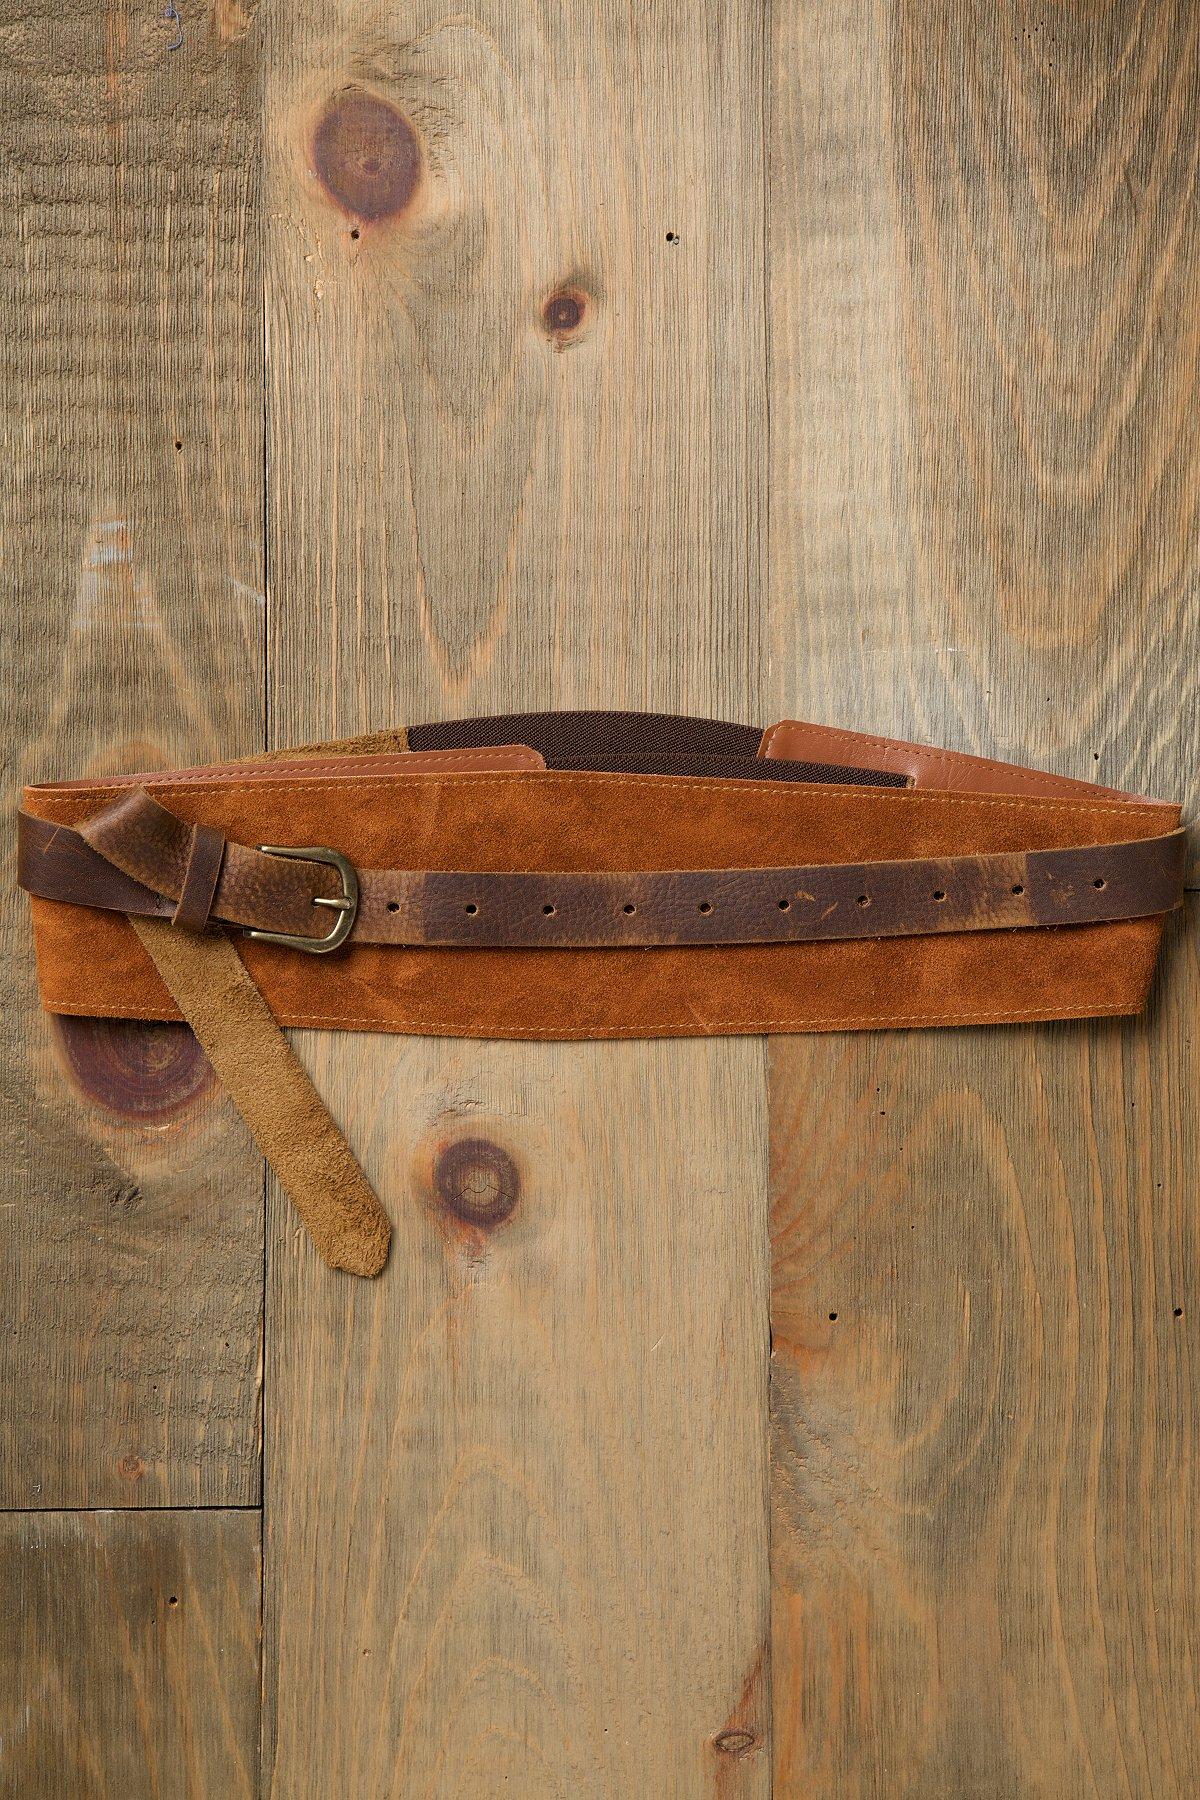 Lara Wrap Waist Belt